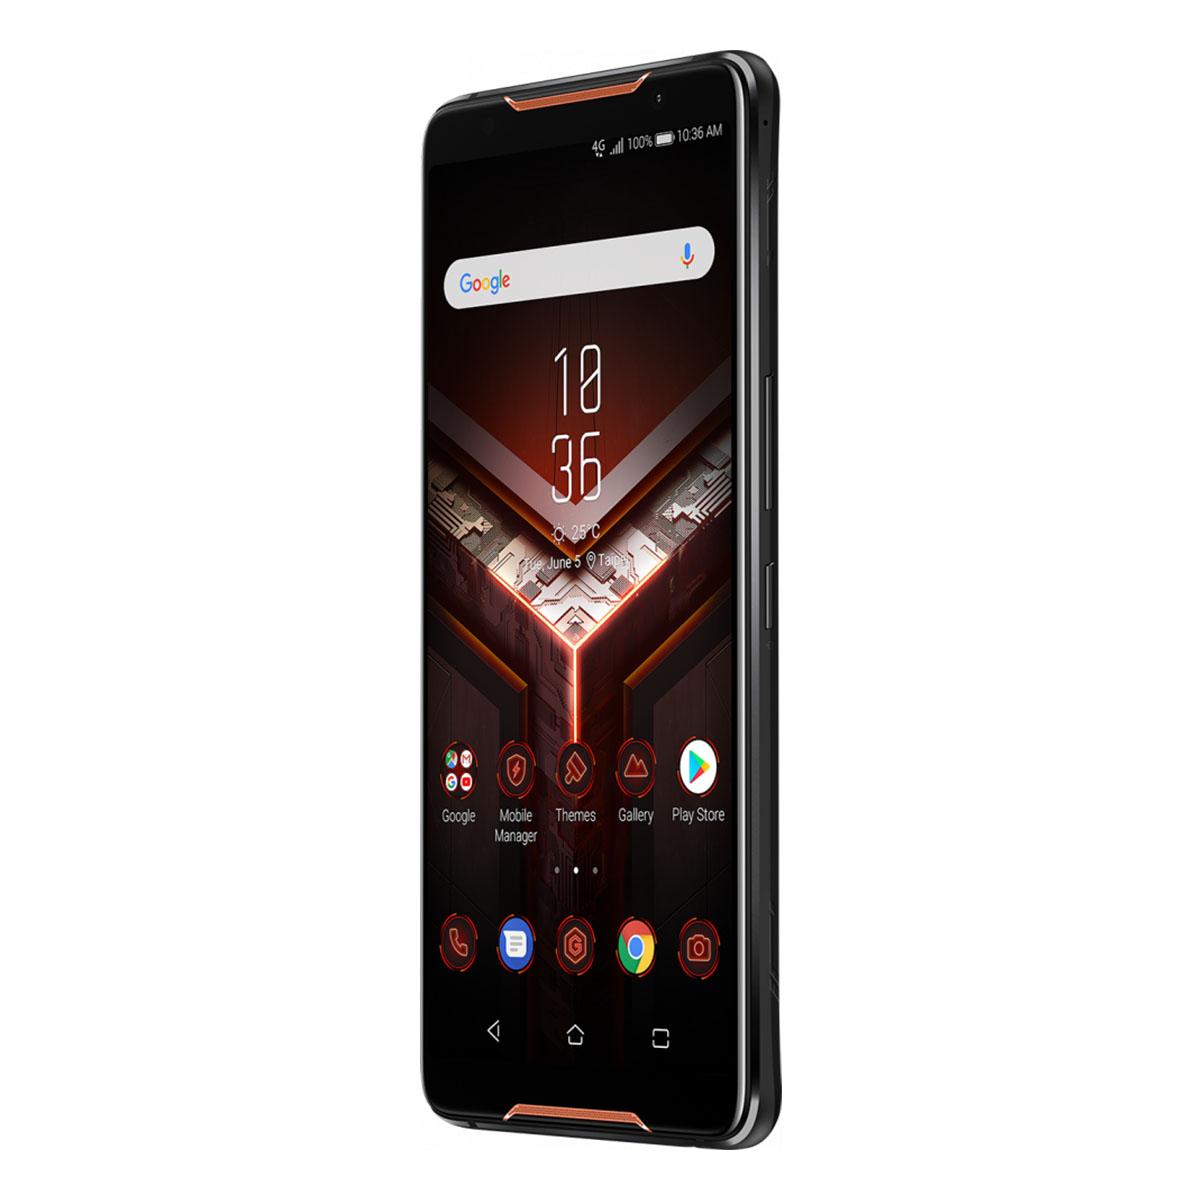 Asus ZS600KL ROG phone